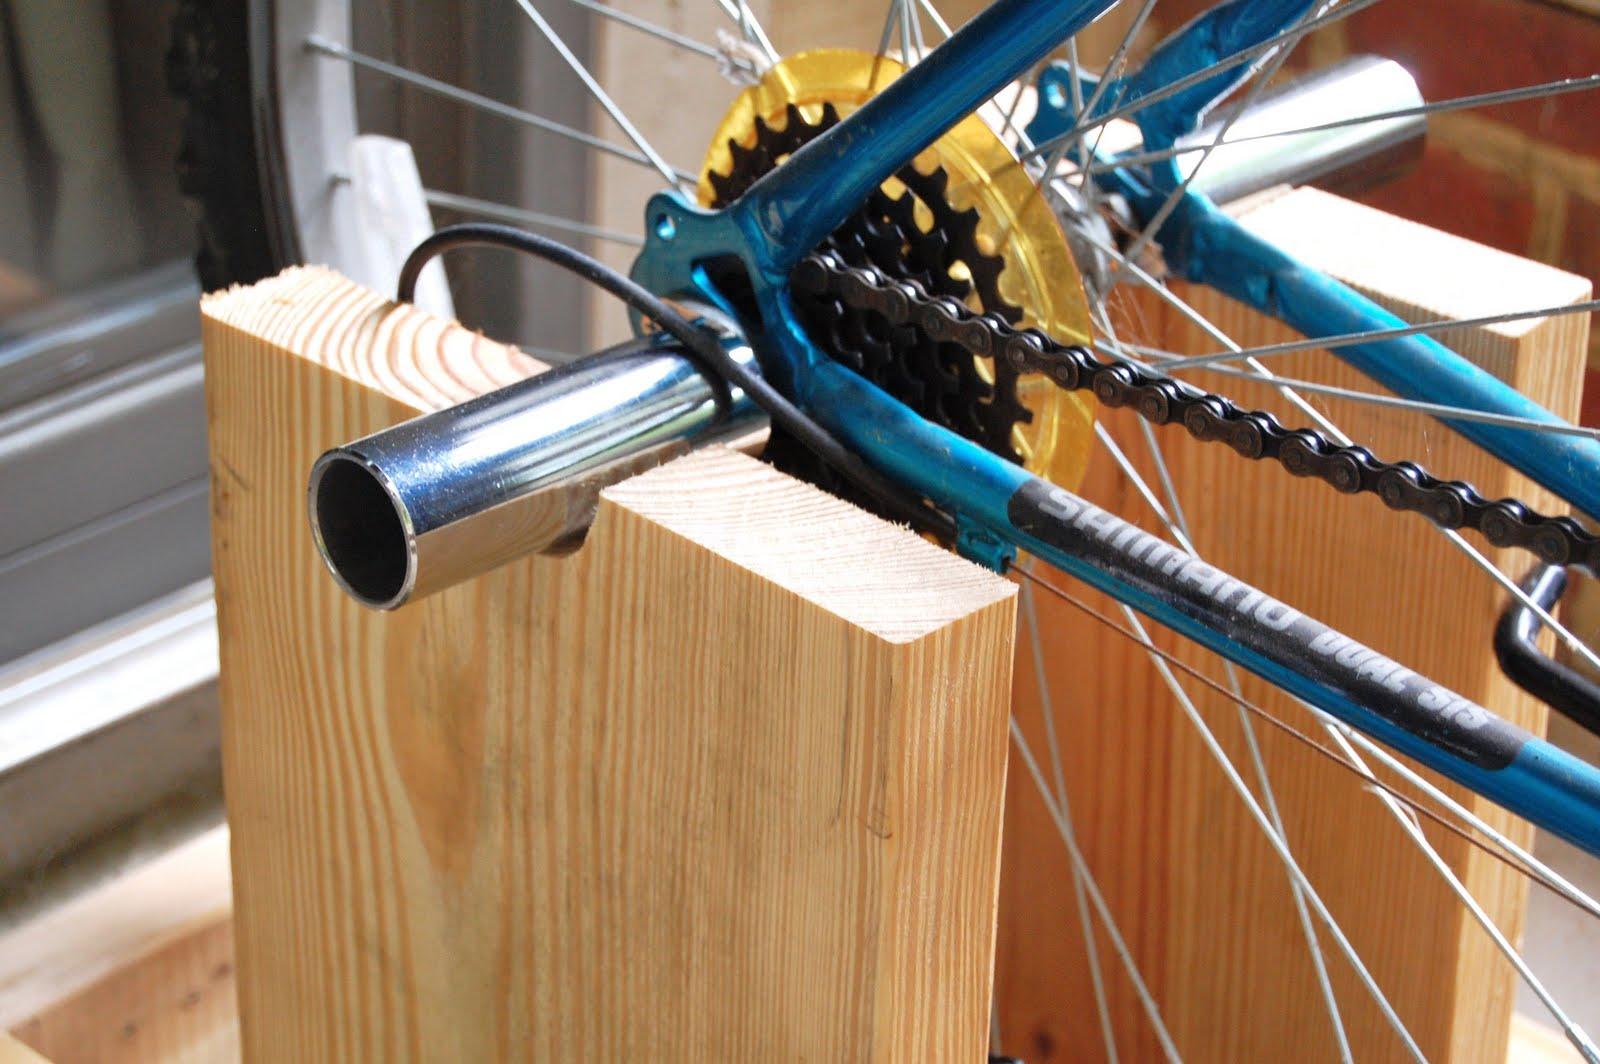 exercise dildo Diy bike with